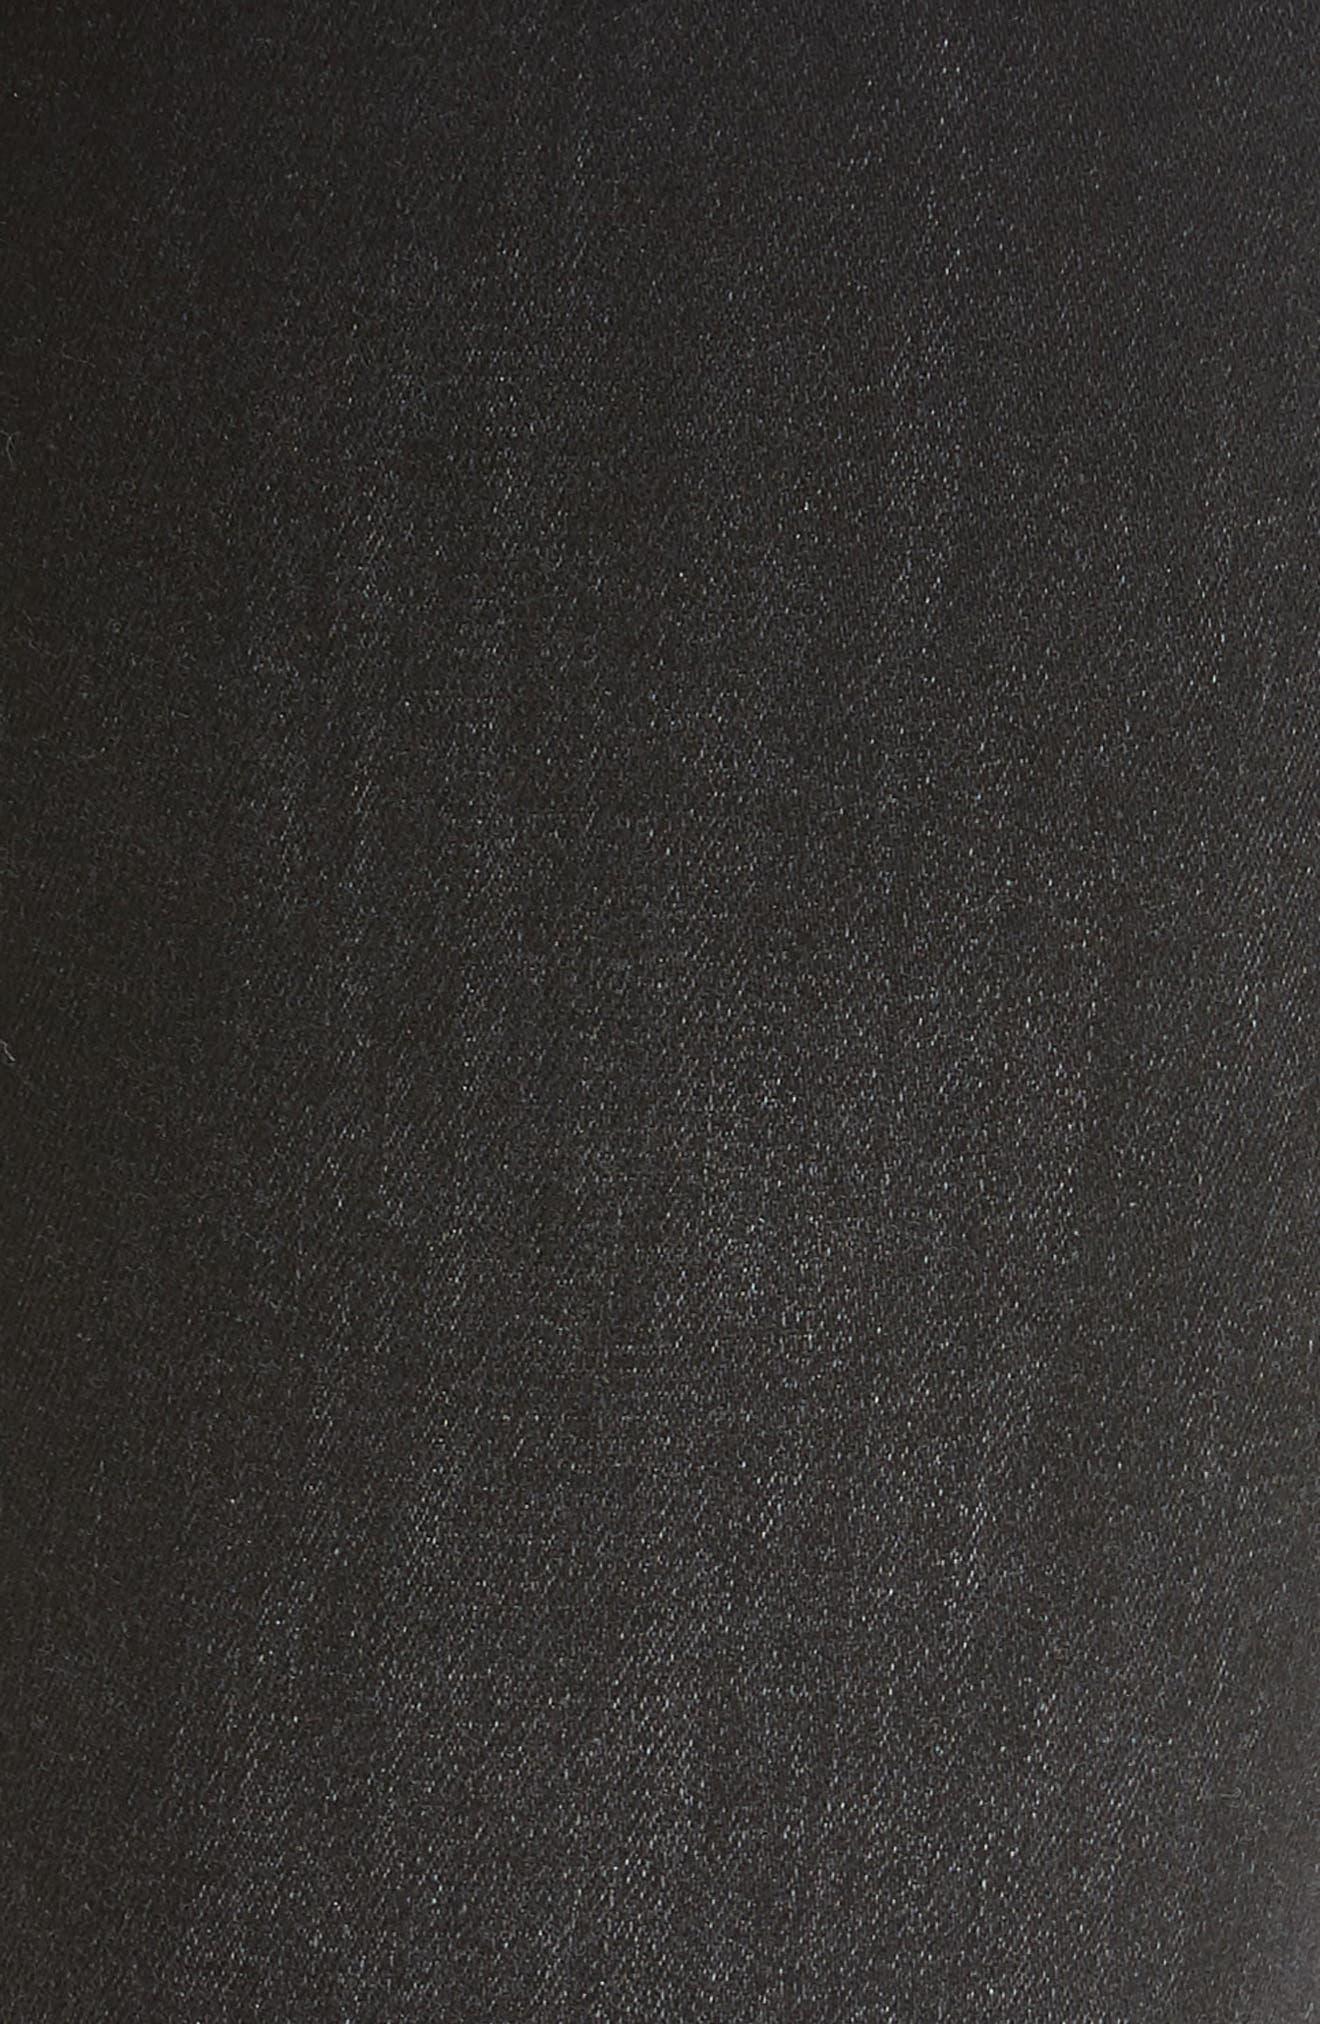 Mara Skinny Jeans,                             Alternate thumbnail 2, color,                             Black